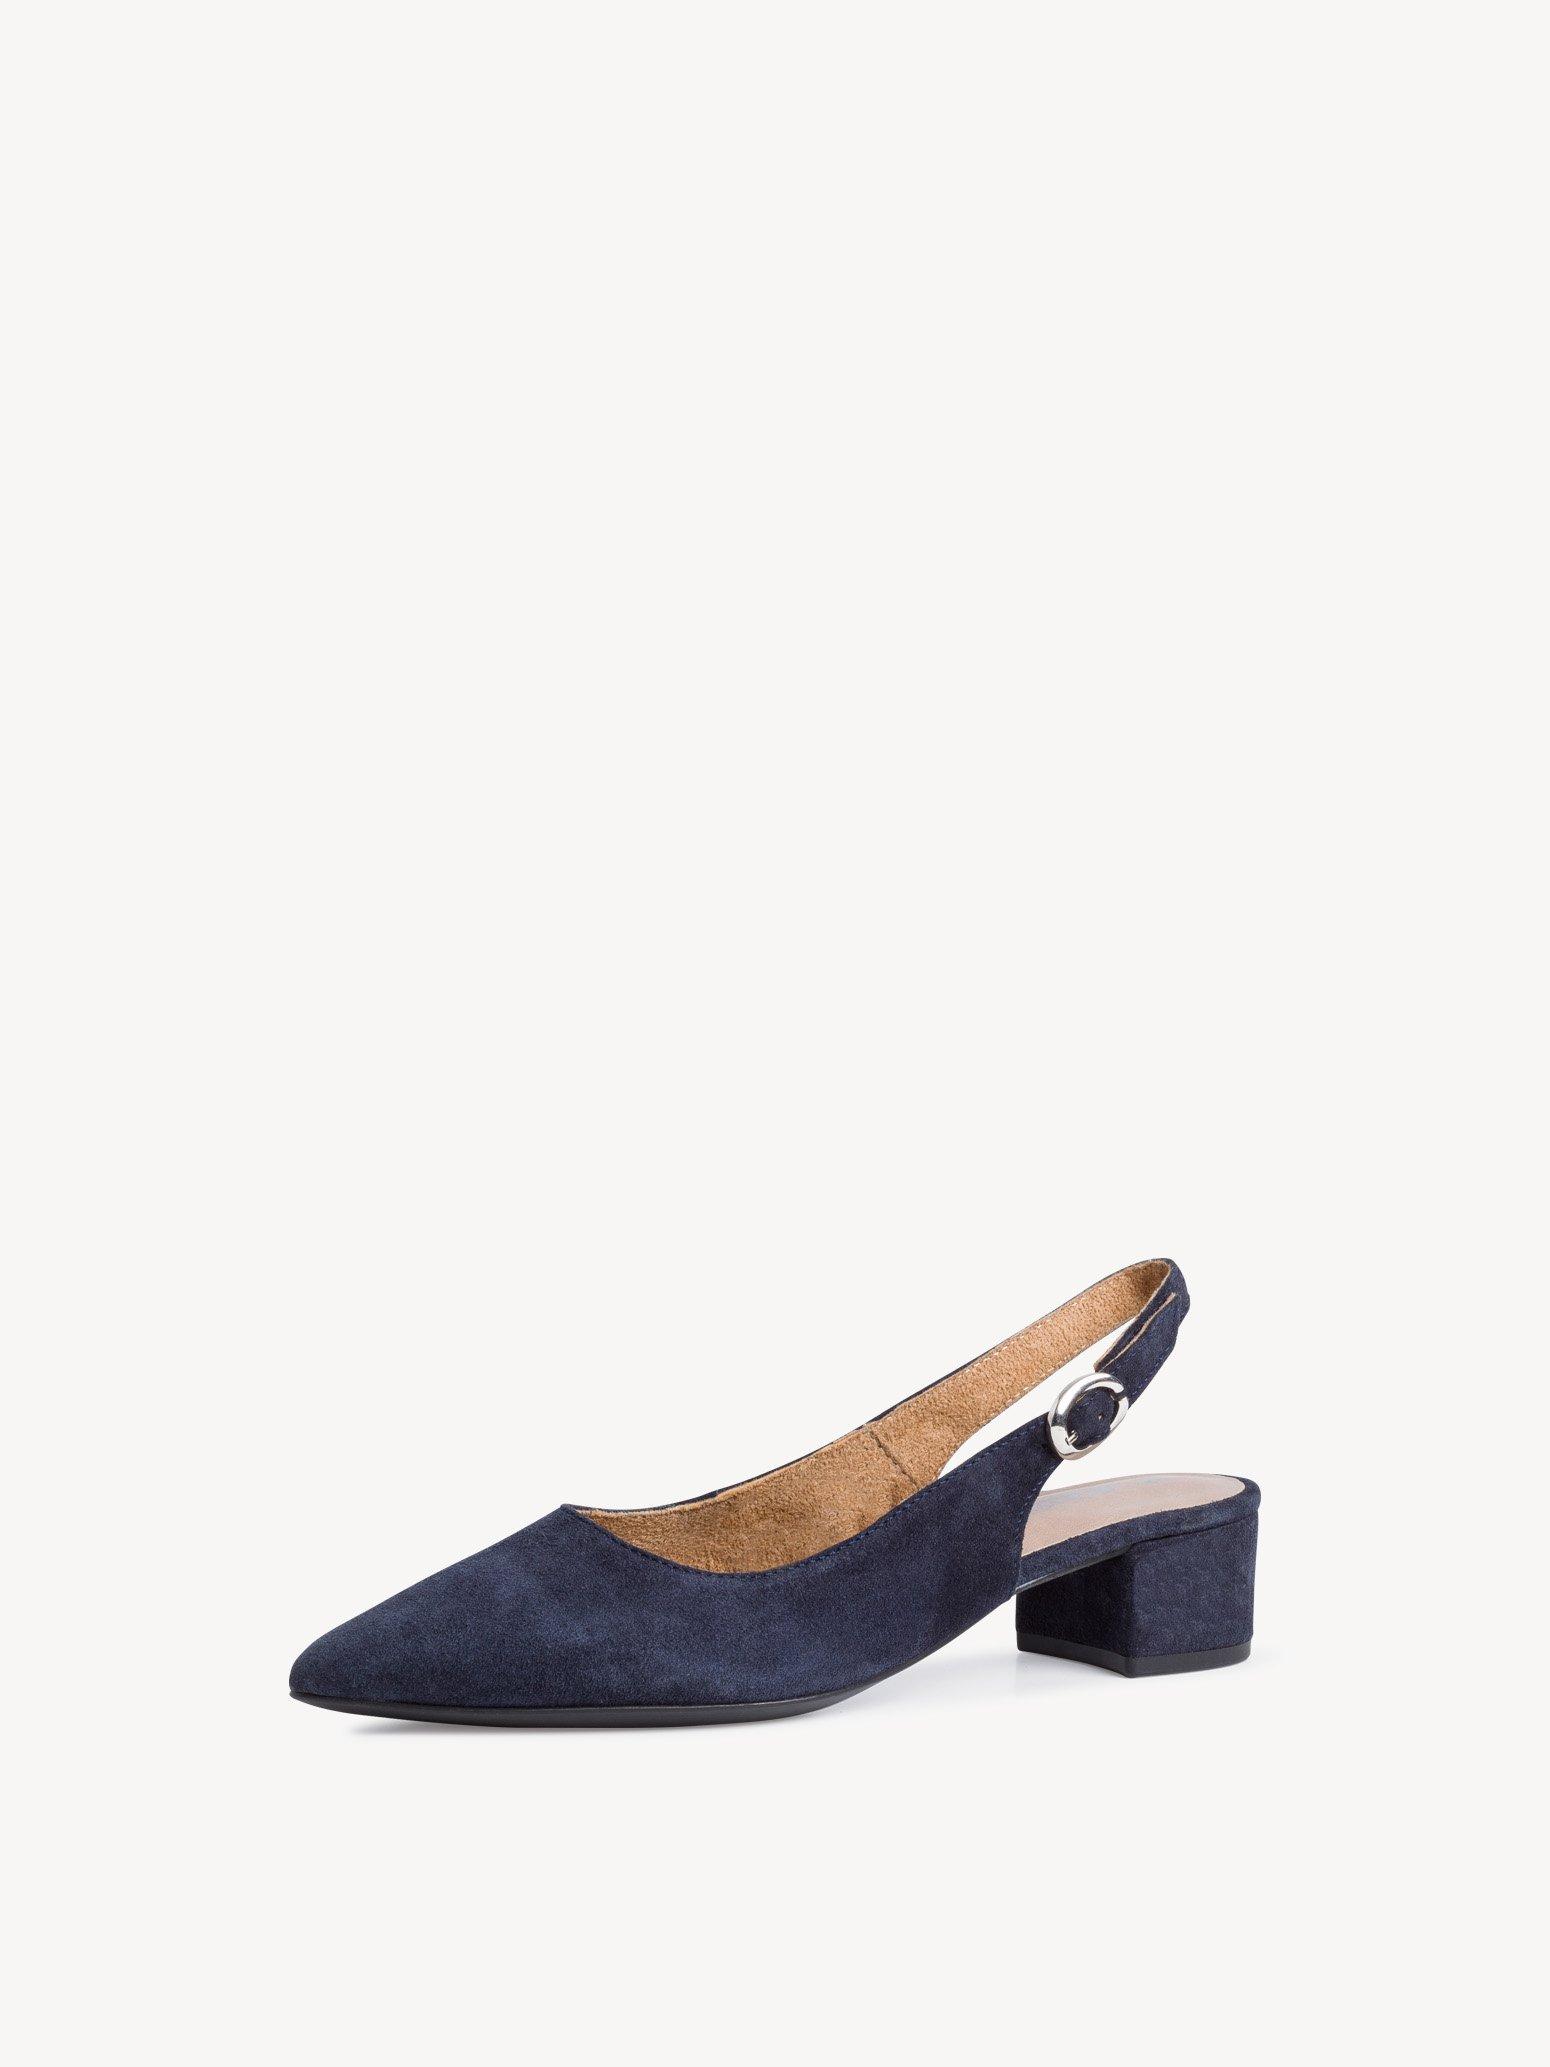 Туфли лодочки Tamaris 1-1-29500-26-805